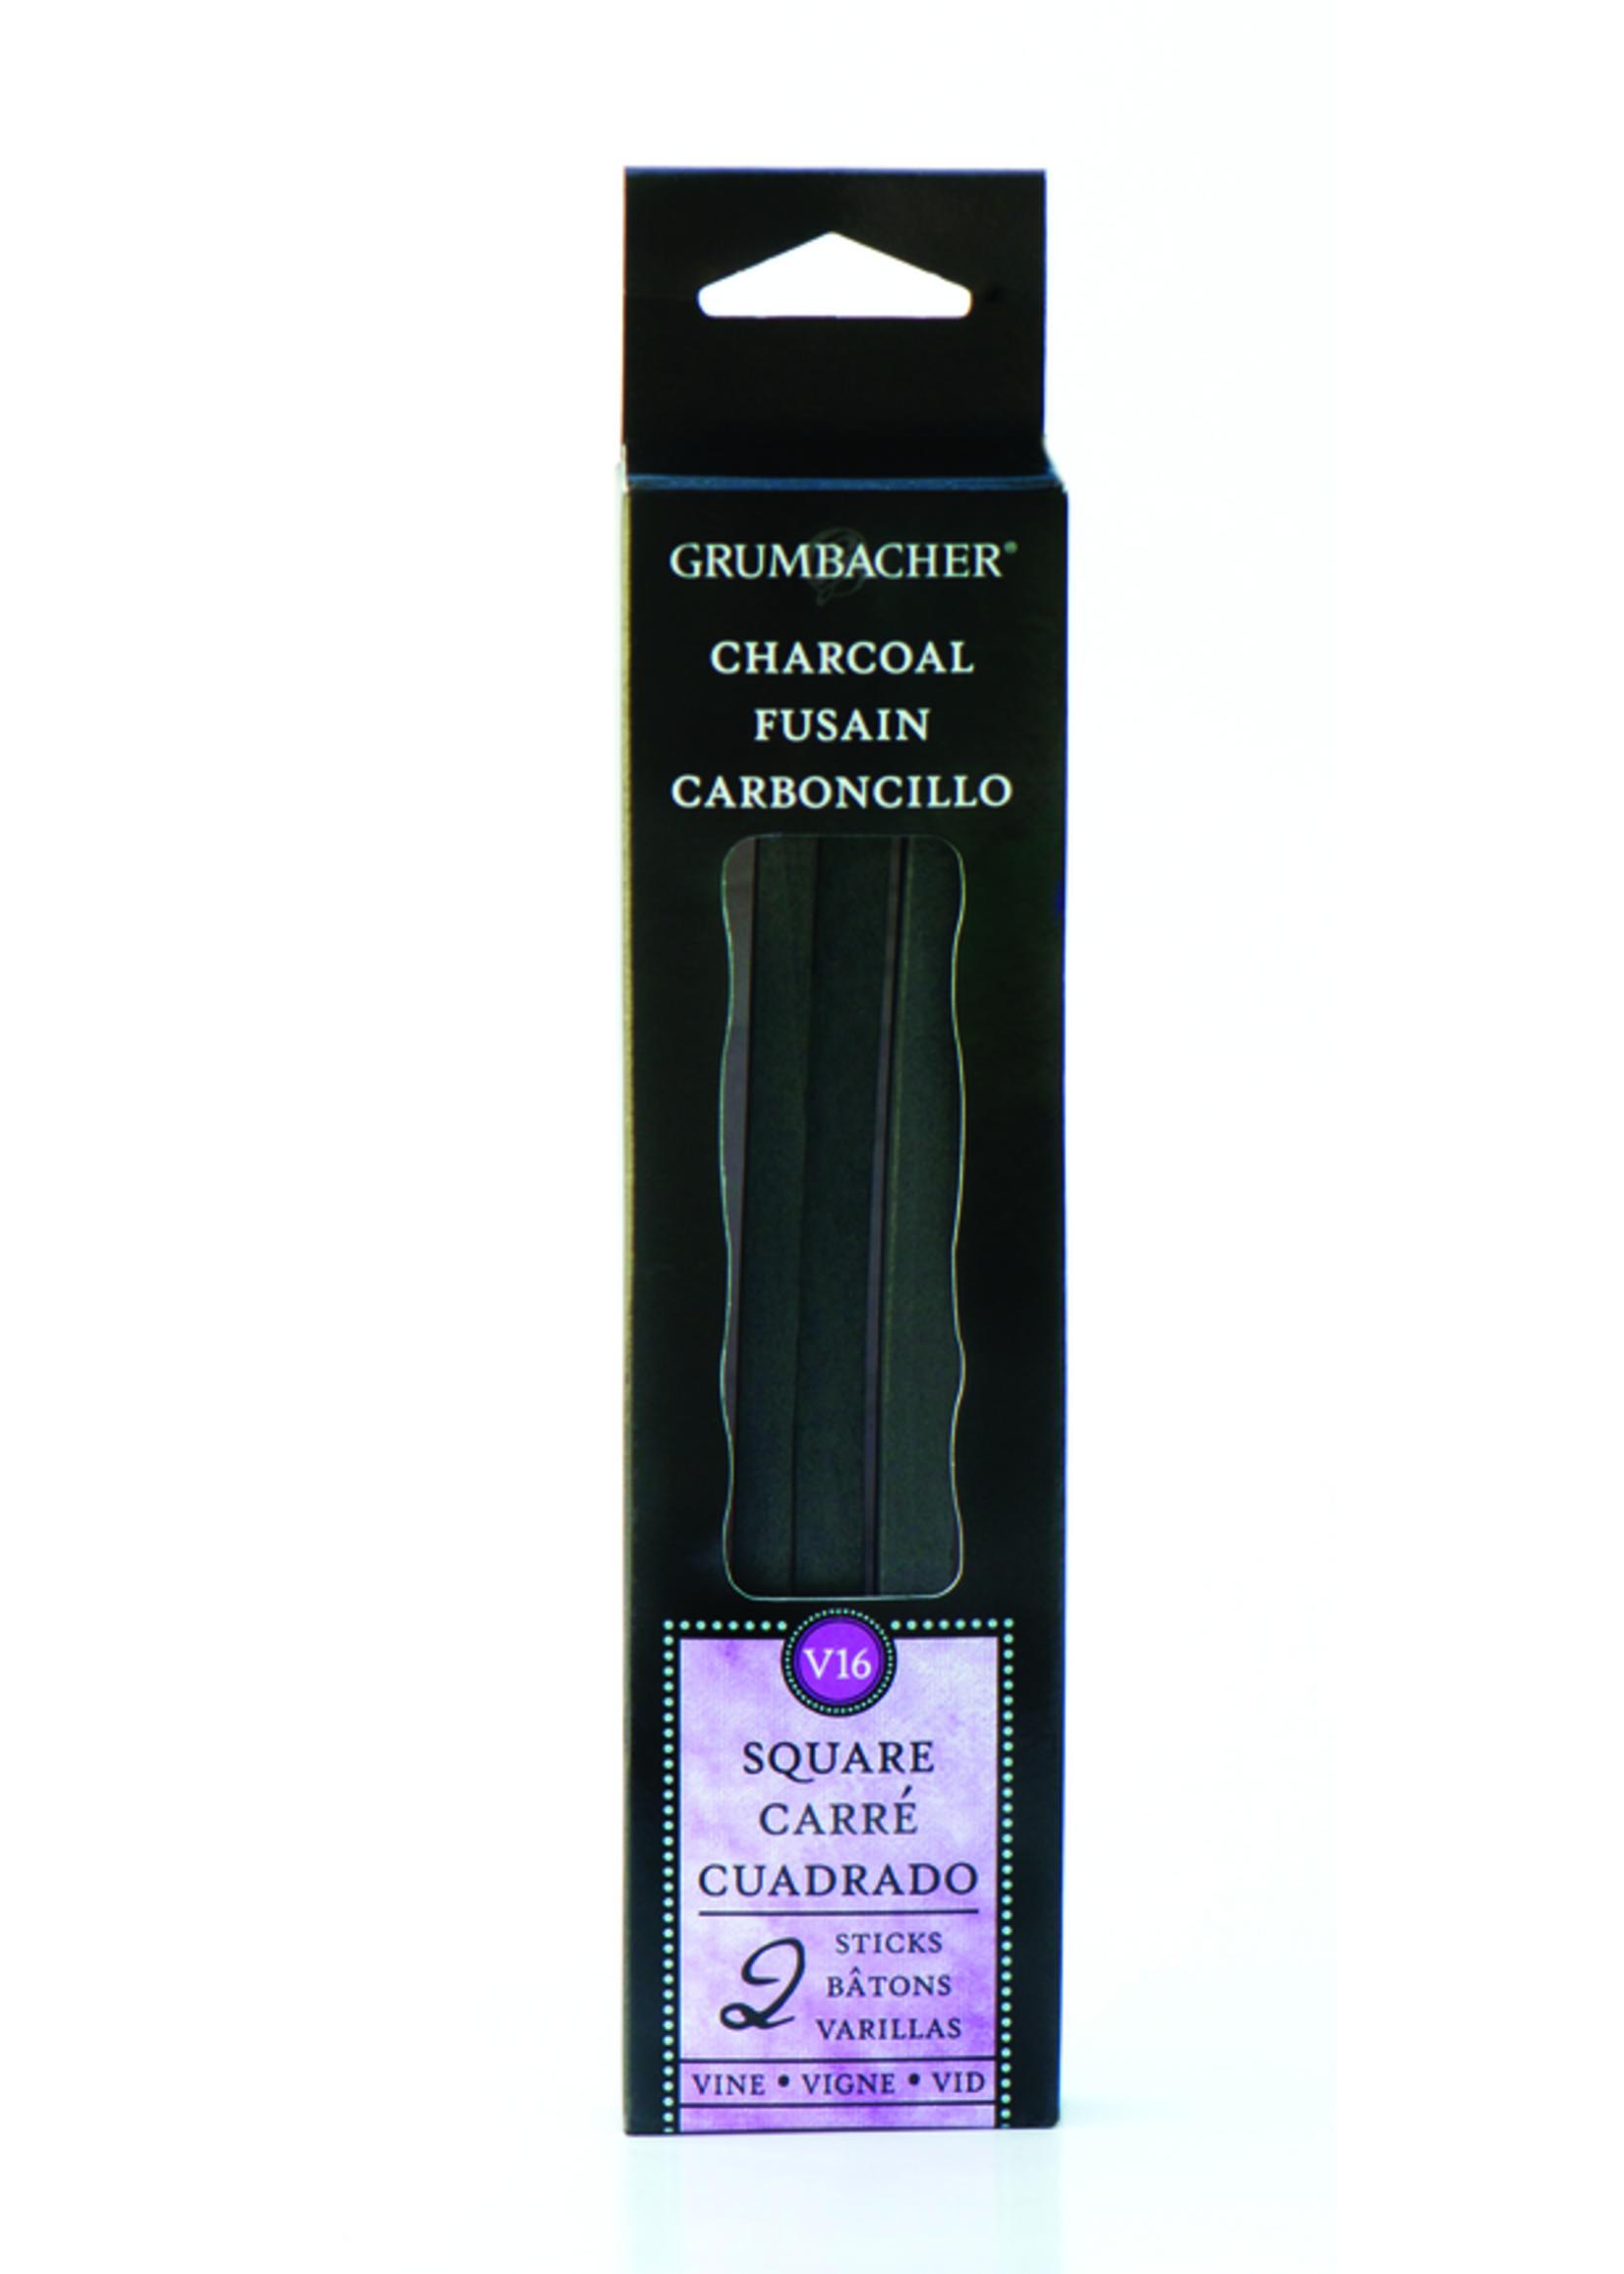 CHARTPAK, INC. GRUMBACHER VINE CHARCOAL